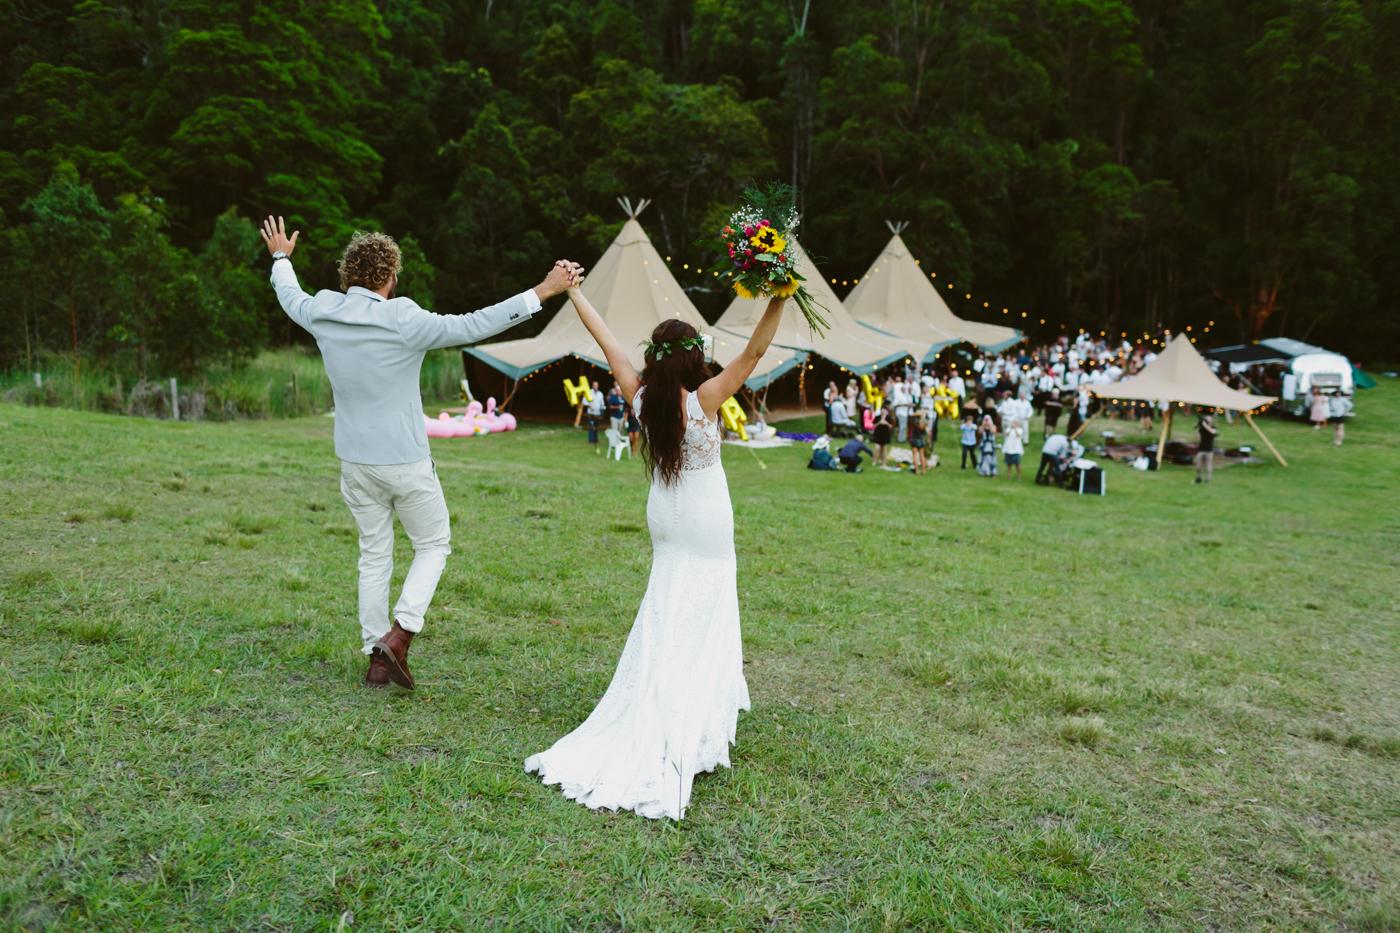 https://goldcoasttipis.com.au/diy-wedding-checklist/